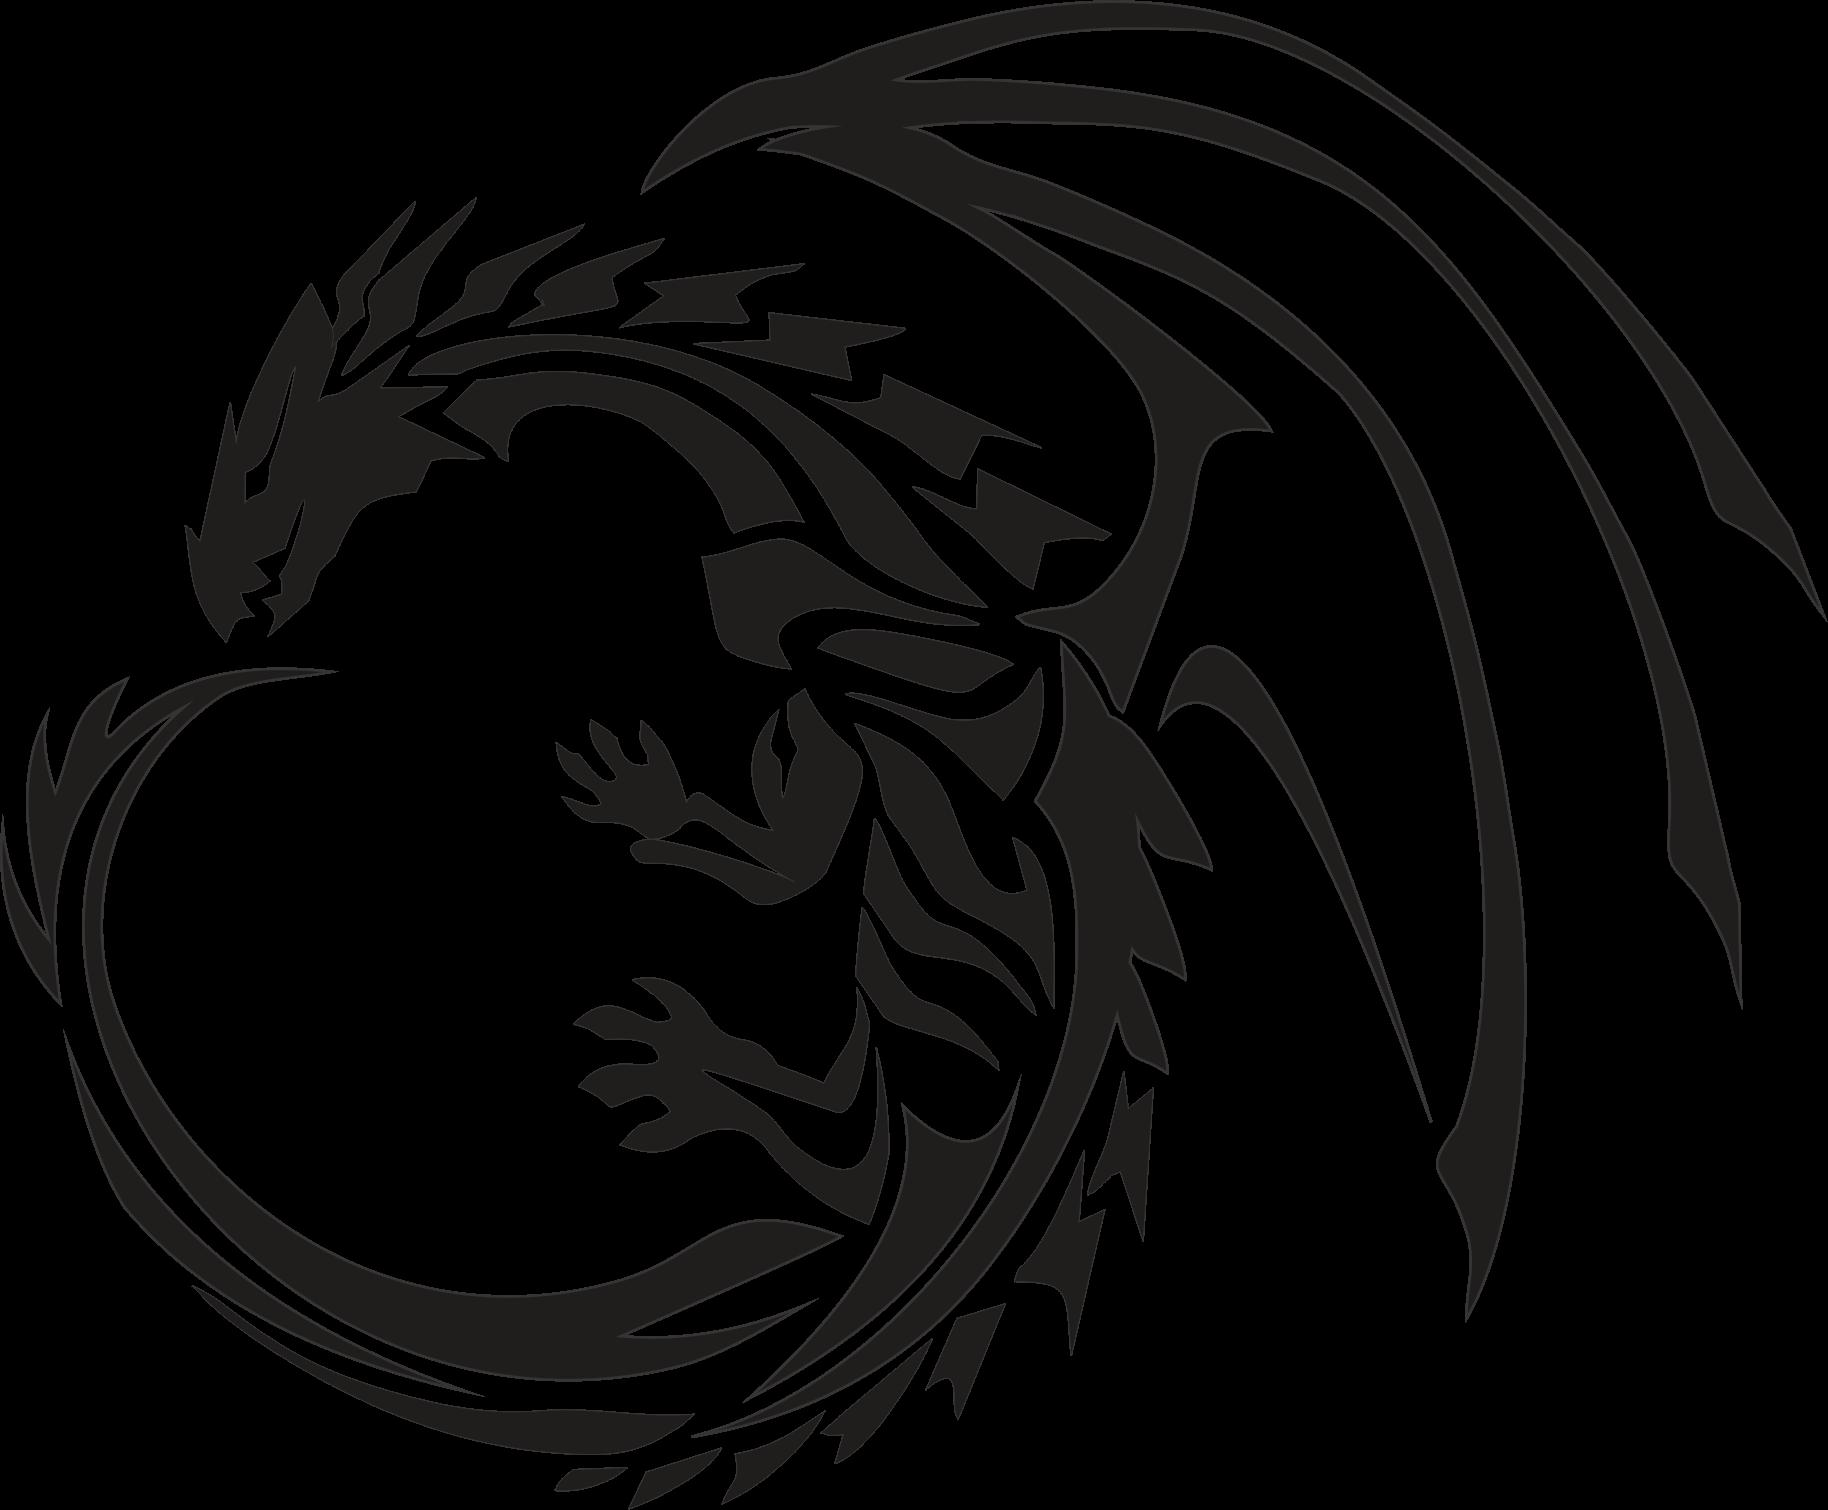 Circle Dragon Tattoo Tribal Dragon Tattoos Dragon Silhouette Dragon Tattoo